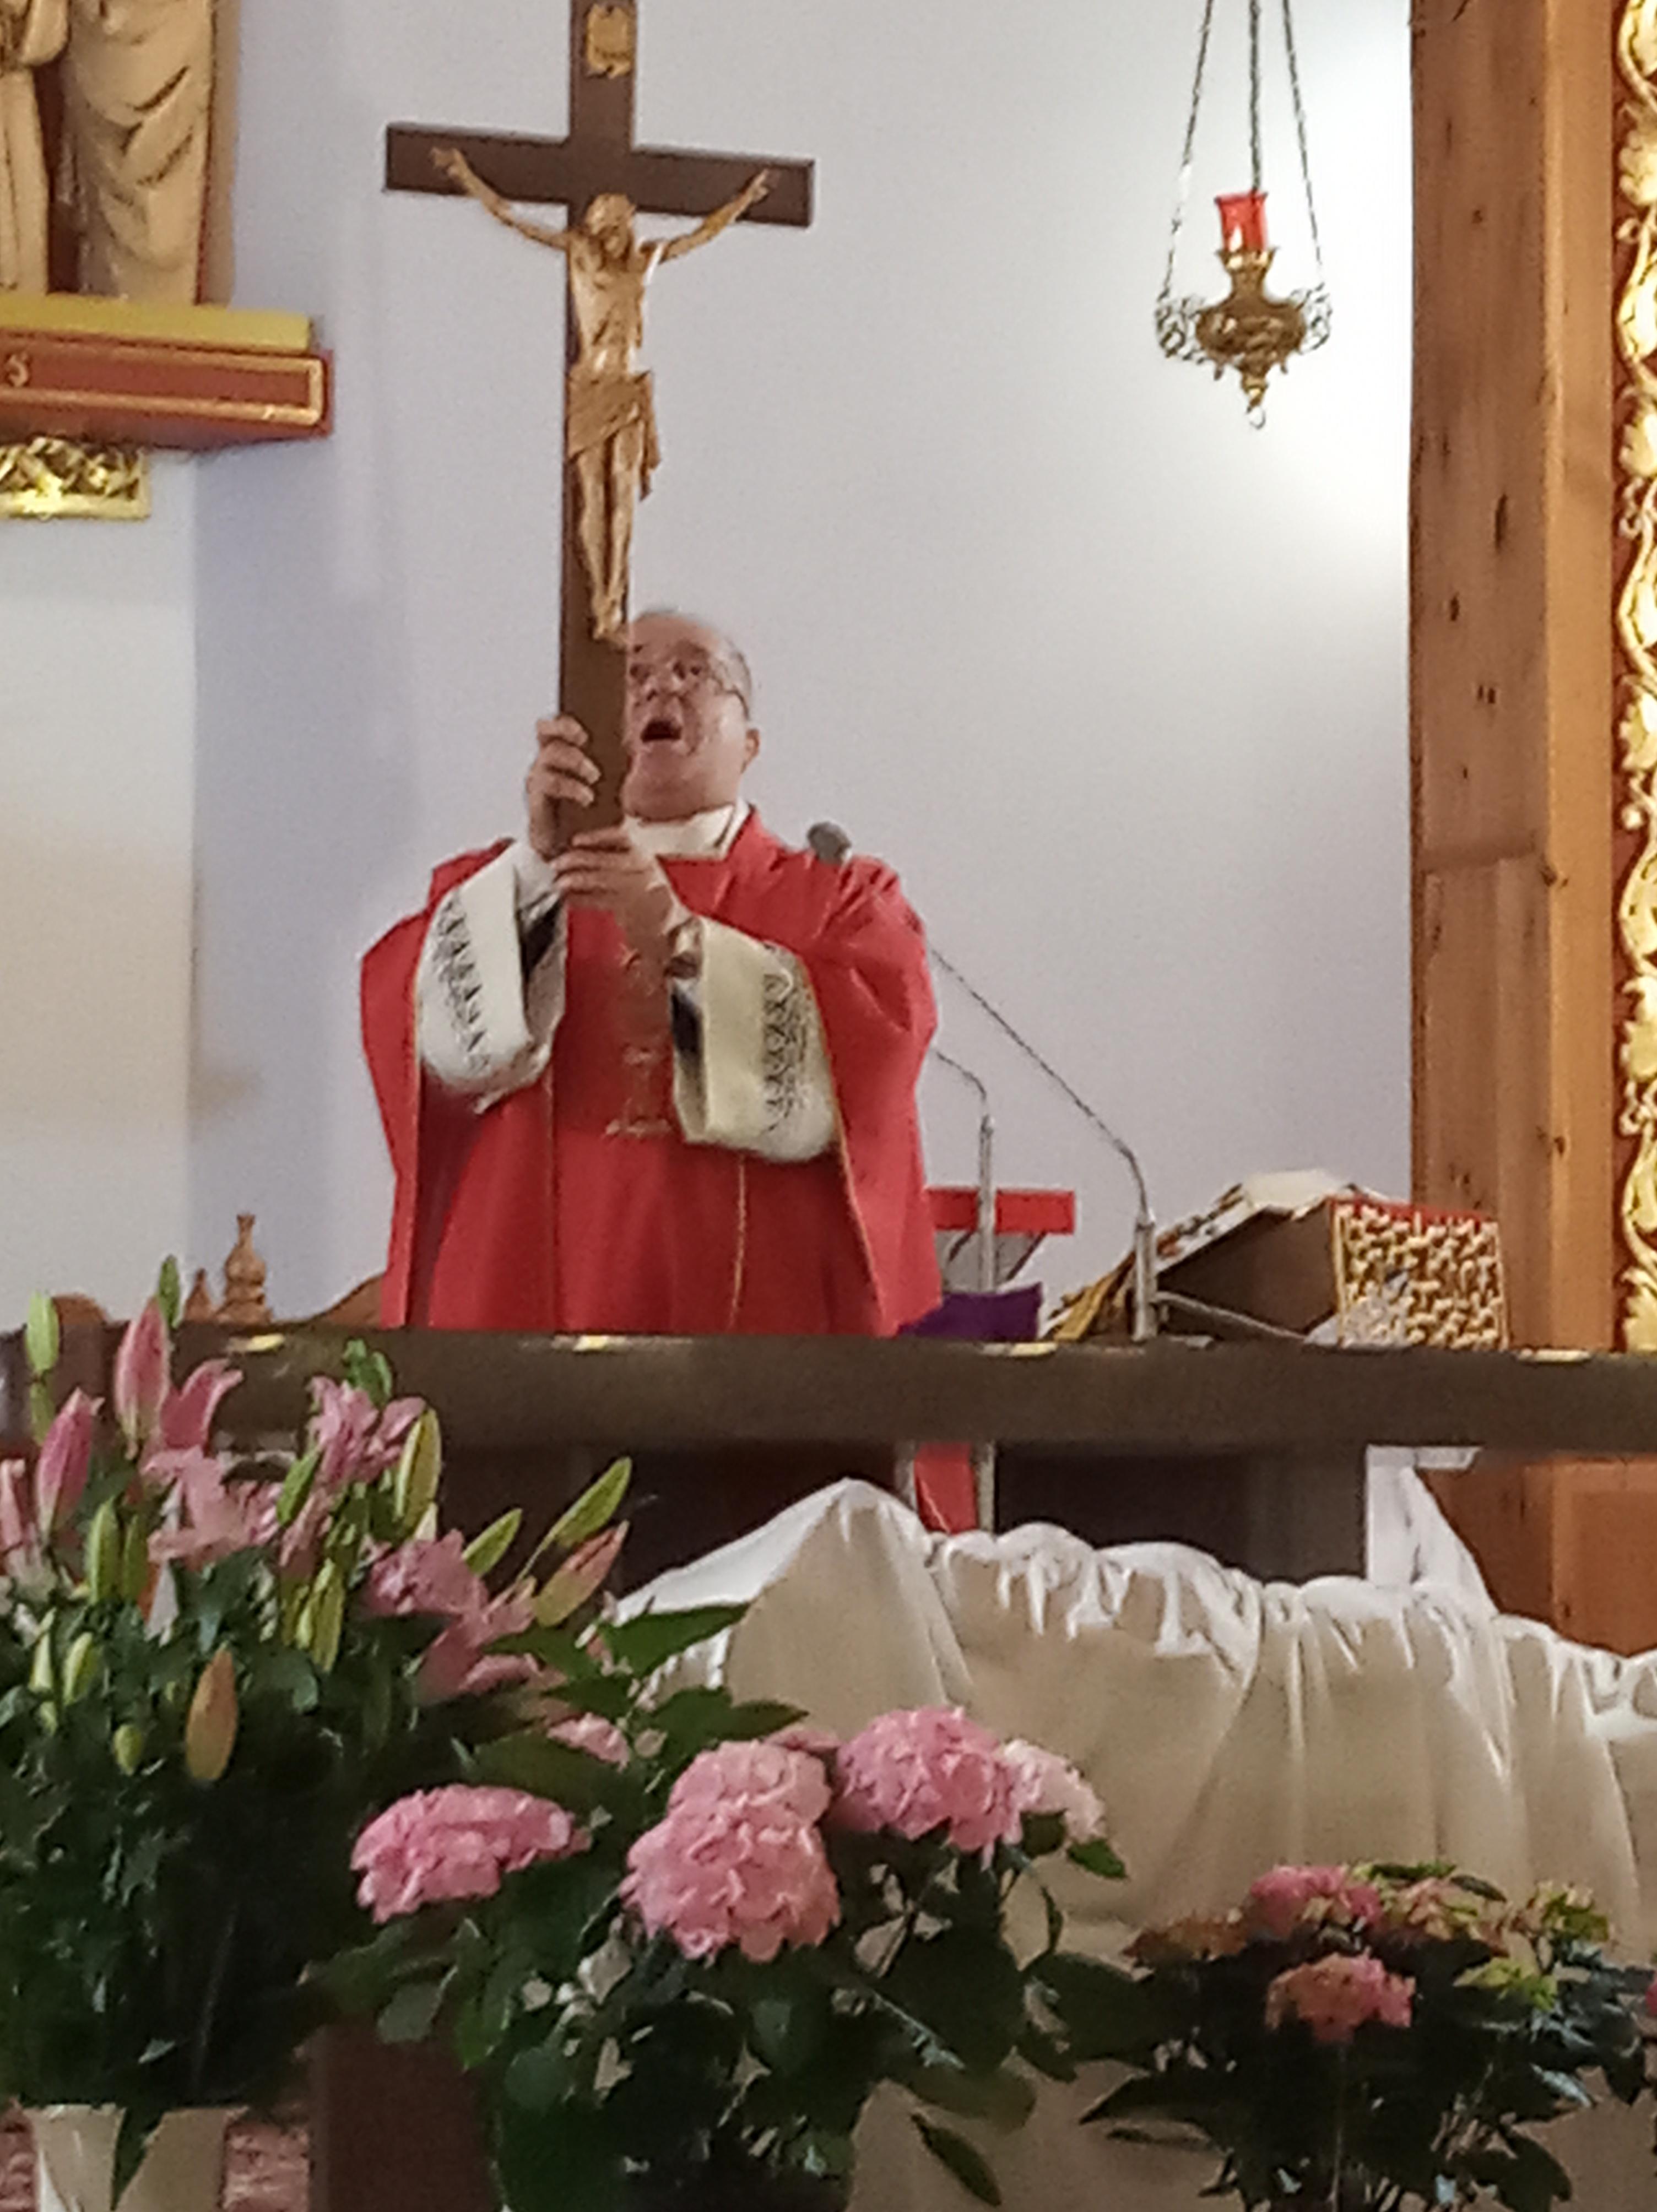 Wielki-Piatek-liturgia-3